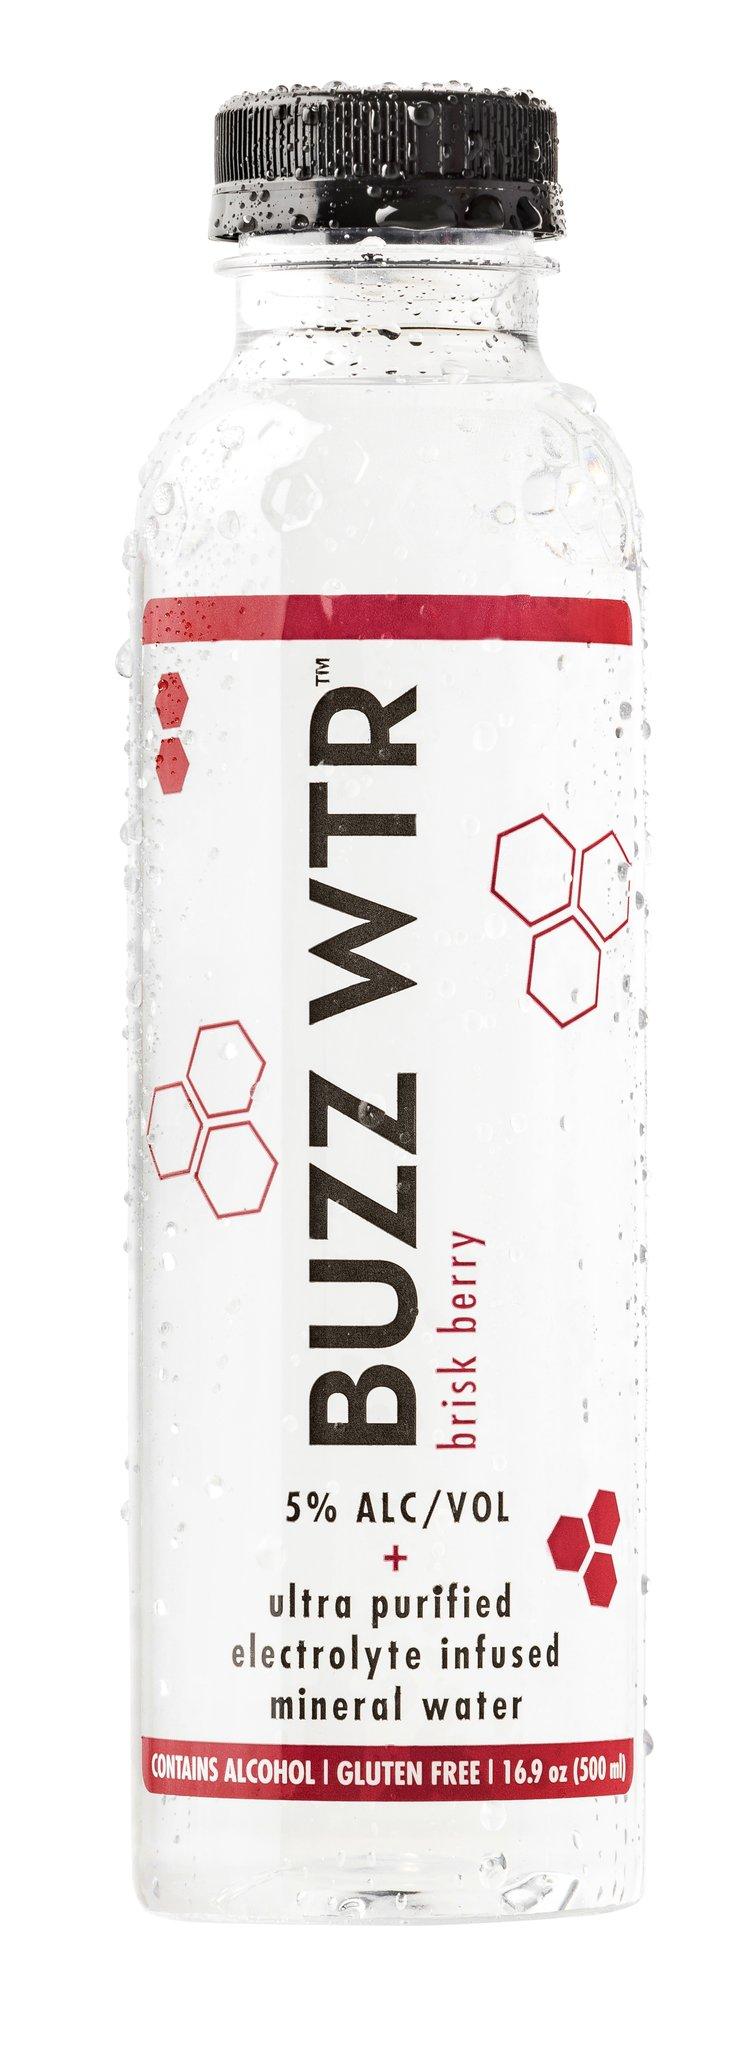 Buzz Wtr Brisk Berry, Where to buy Buzz Wtr, Order Buzz Wtr online, Buzz Wtr Gifts, Send Buzz Wtr, Alcoholic Water, Alcoholic Seltzer